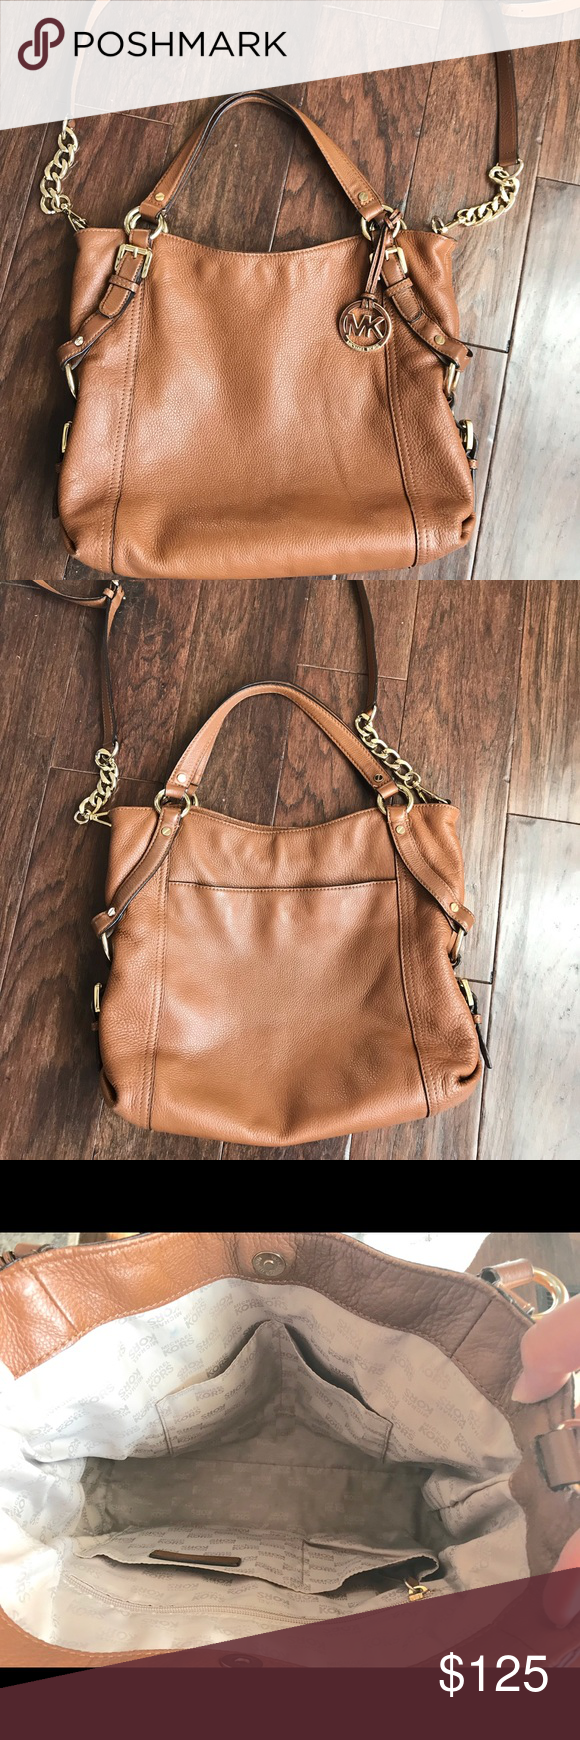 323ac50e344 Authentic Michael Kors Handbag/Crossbody EXCELLENT used condition ...